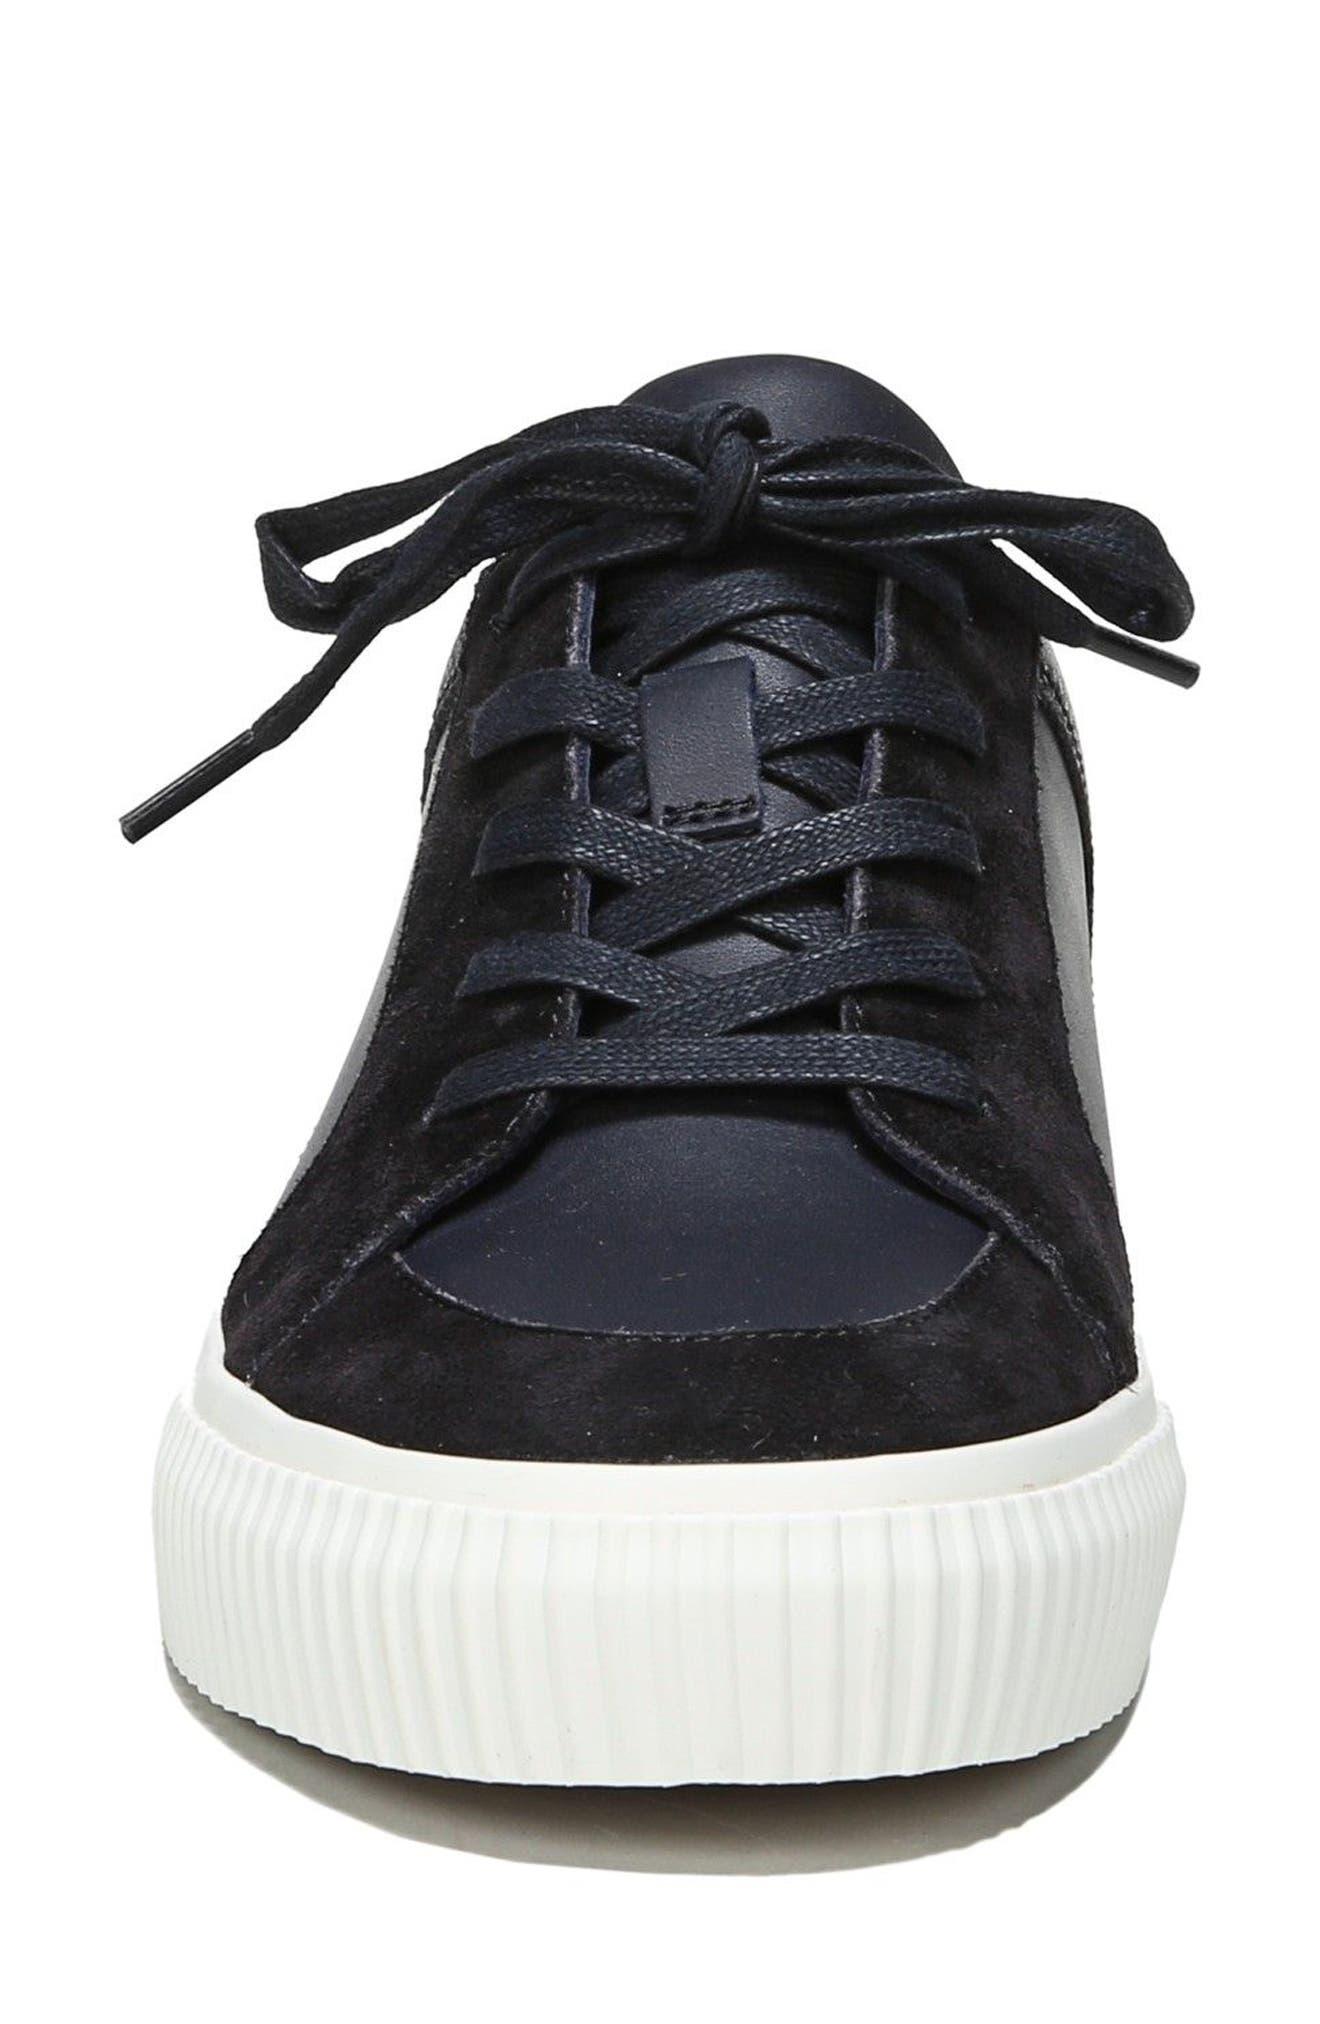 Kess Slip-On Sneaker,                             Alternate thumbnail 4, color,                             Coastal